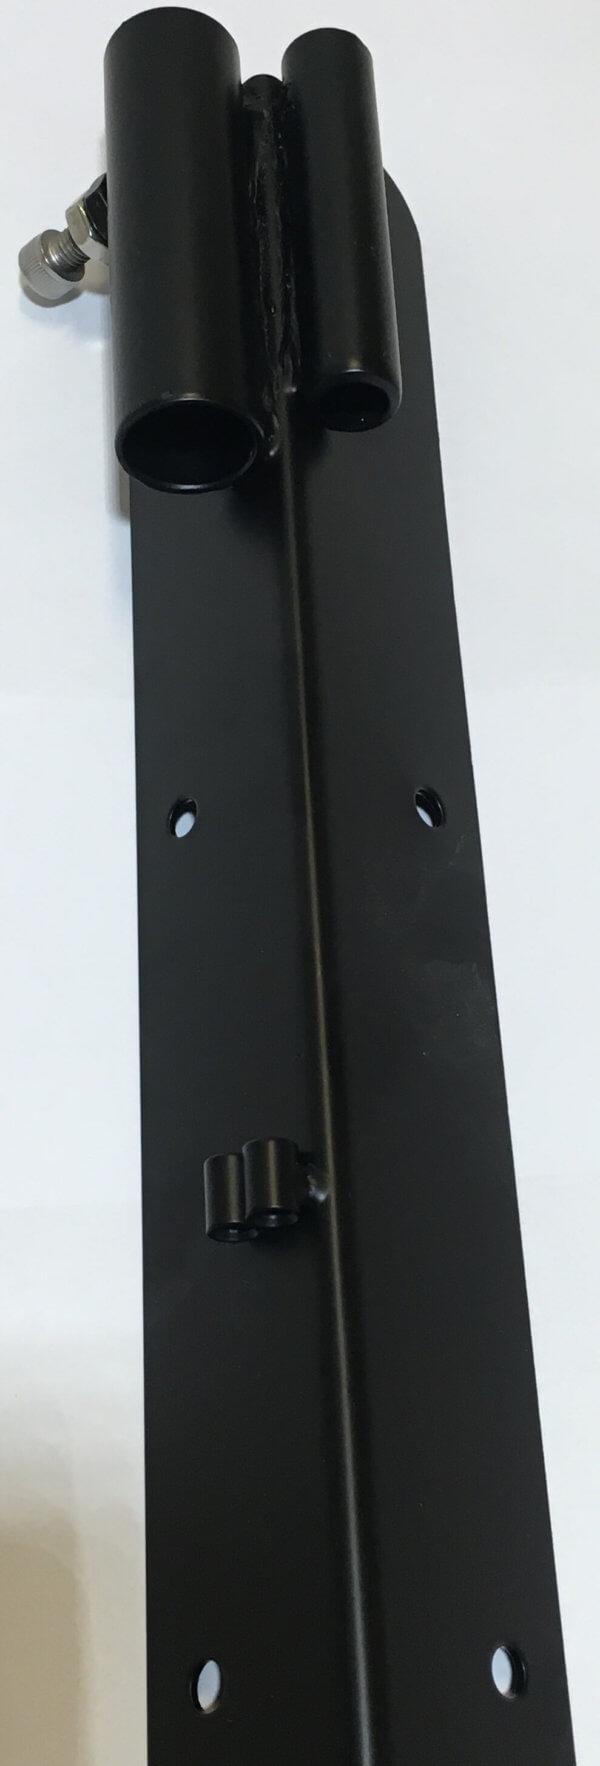 Metall hörnet lådcykel